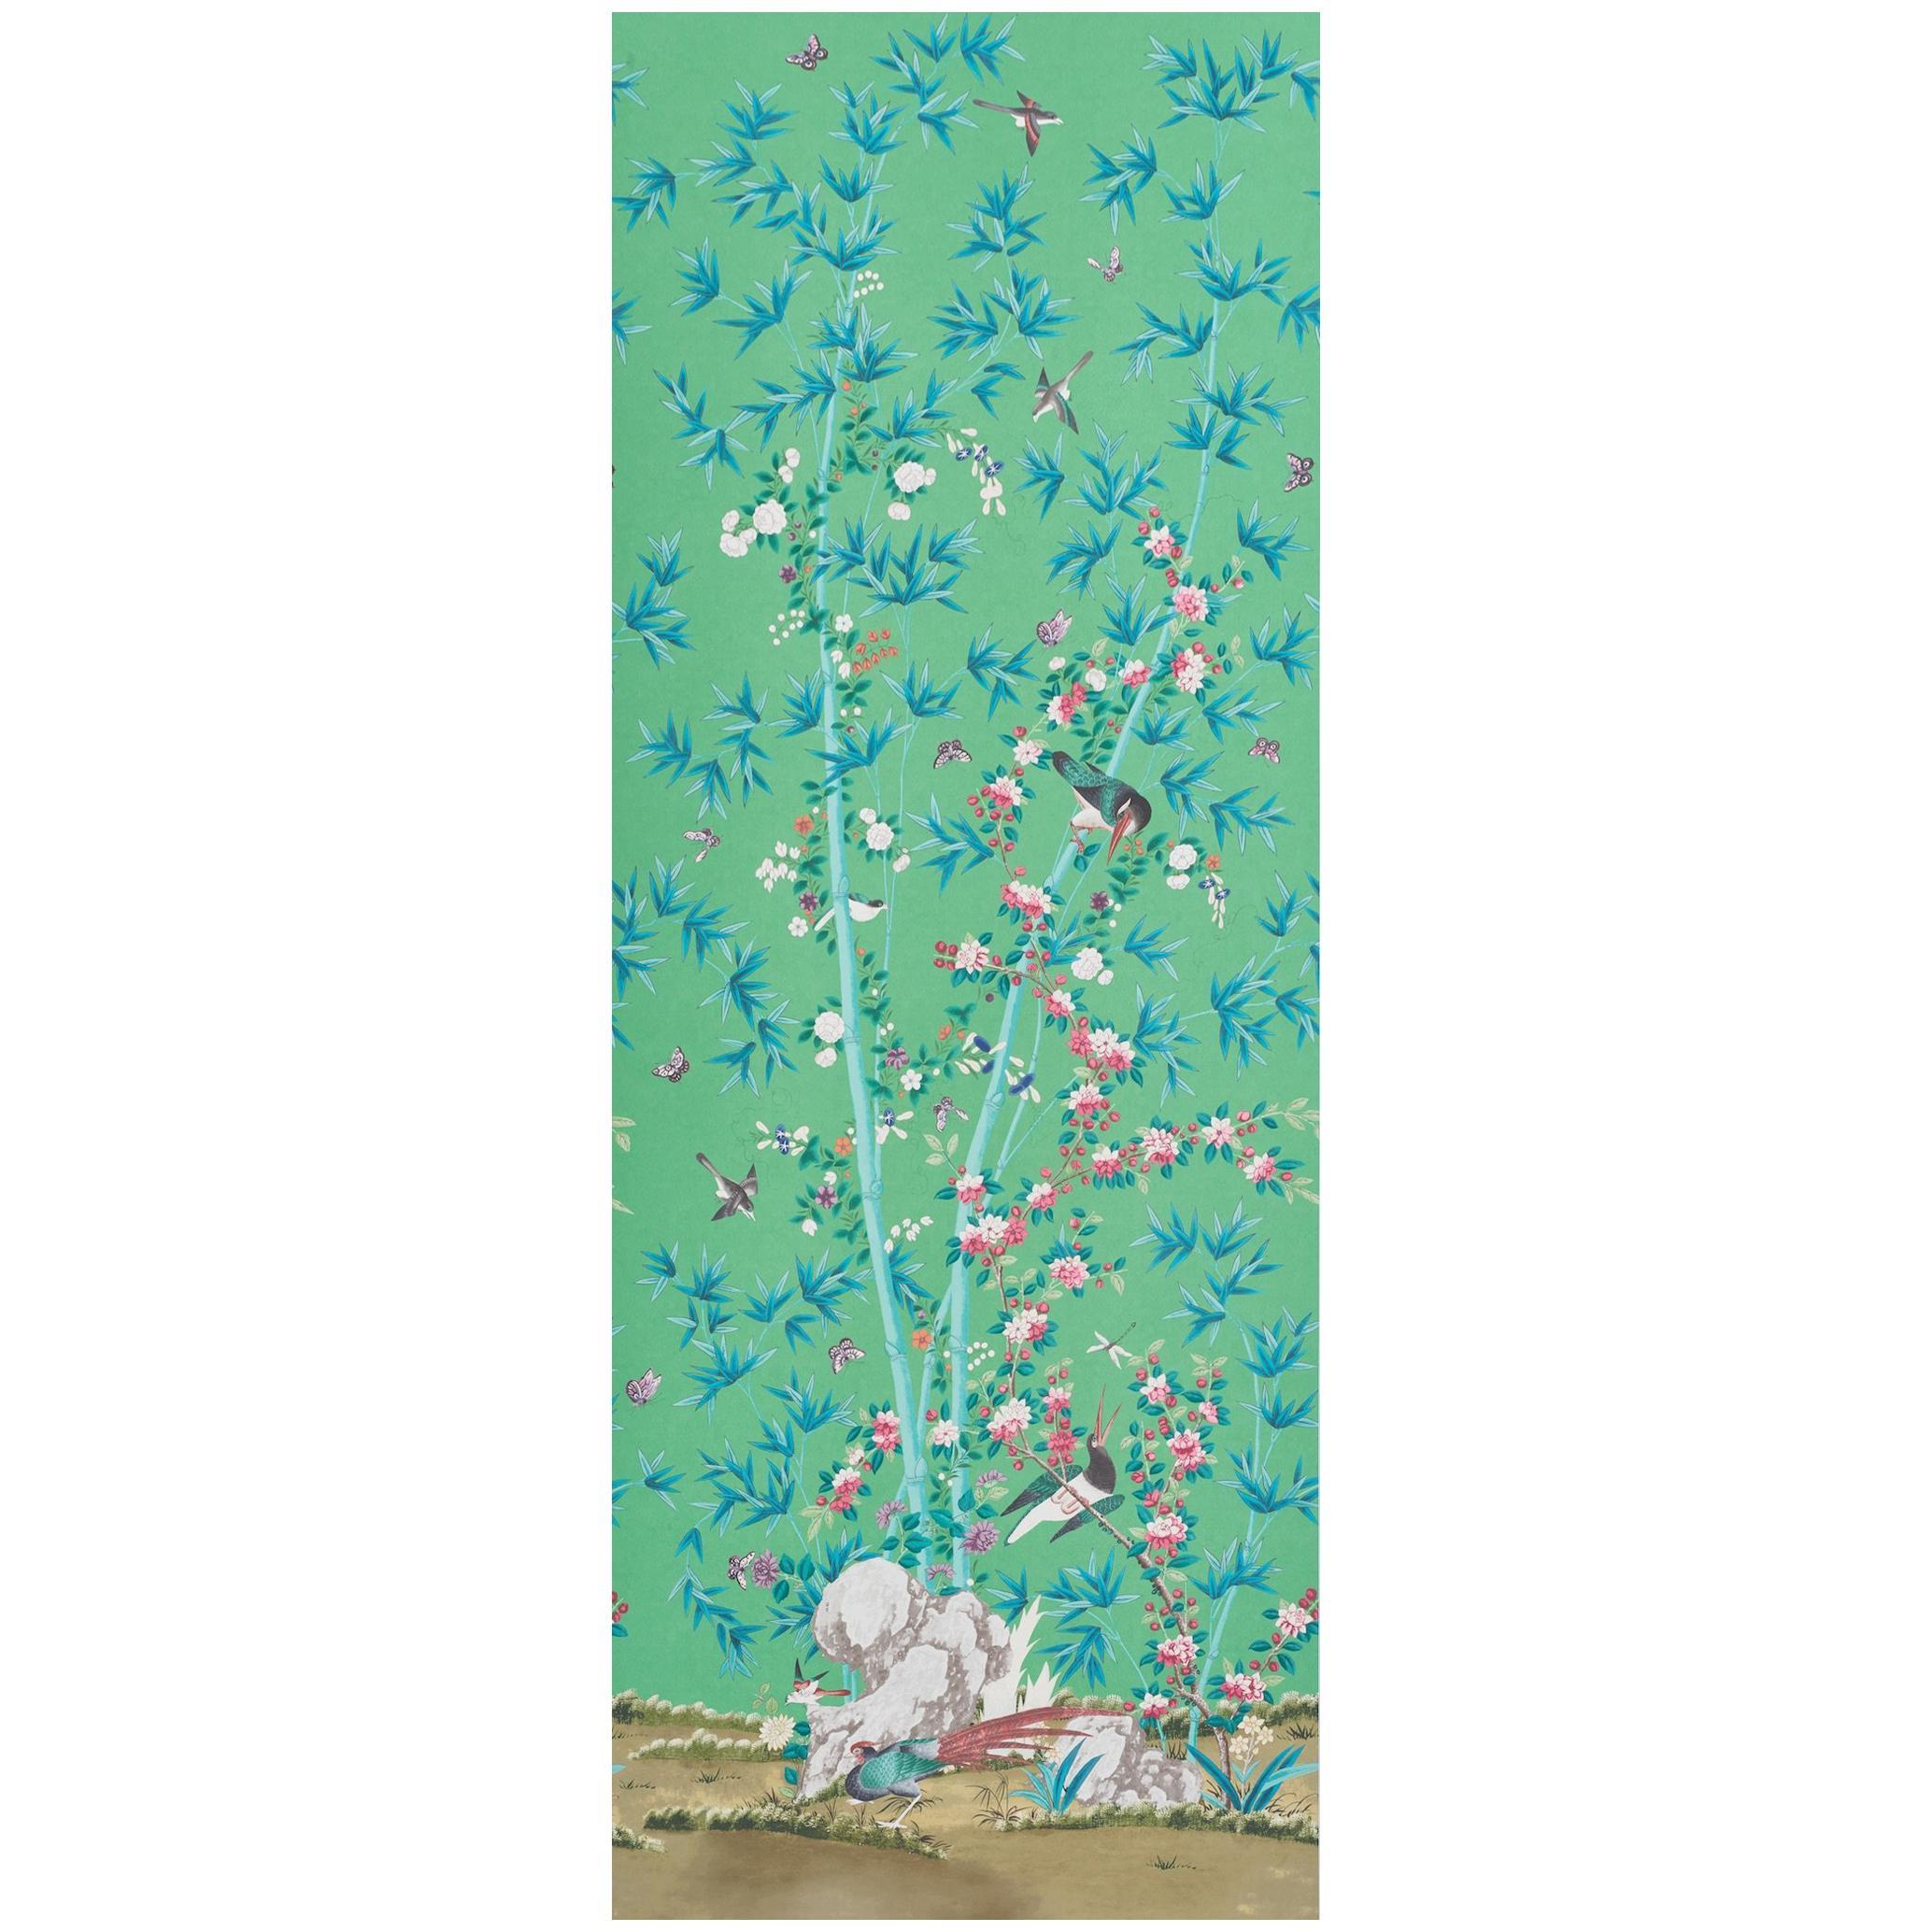 Schumacher Miles Redd Brighton Pavilion Chinoiserie Emerald Wallpaper Panel